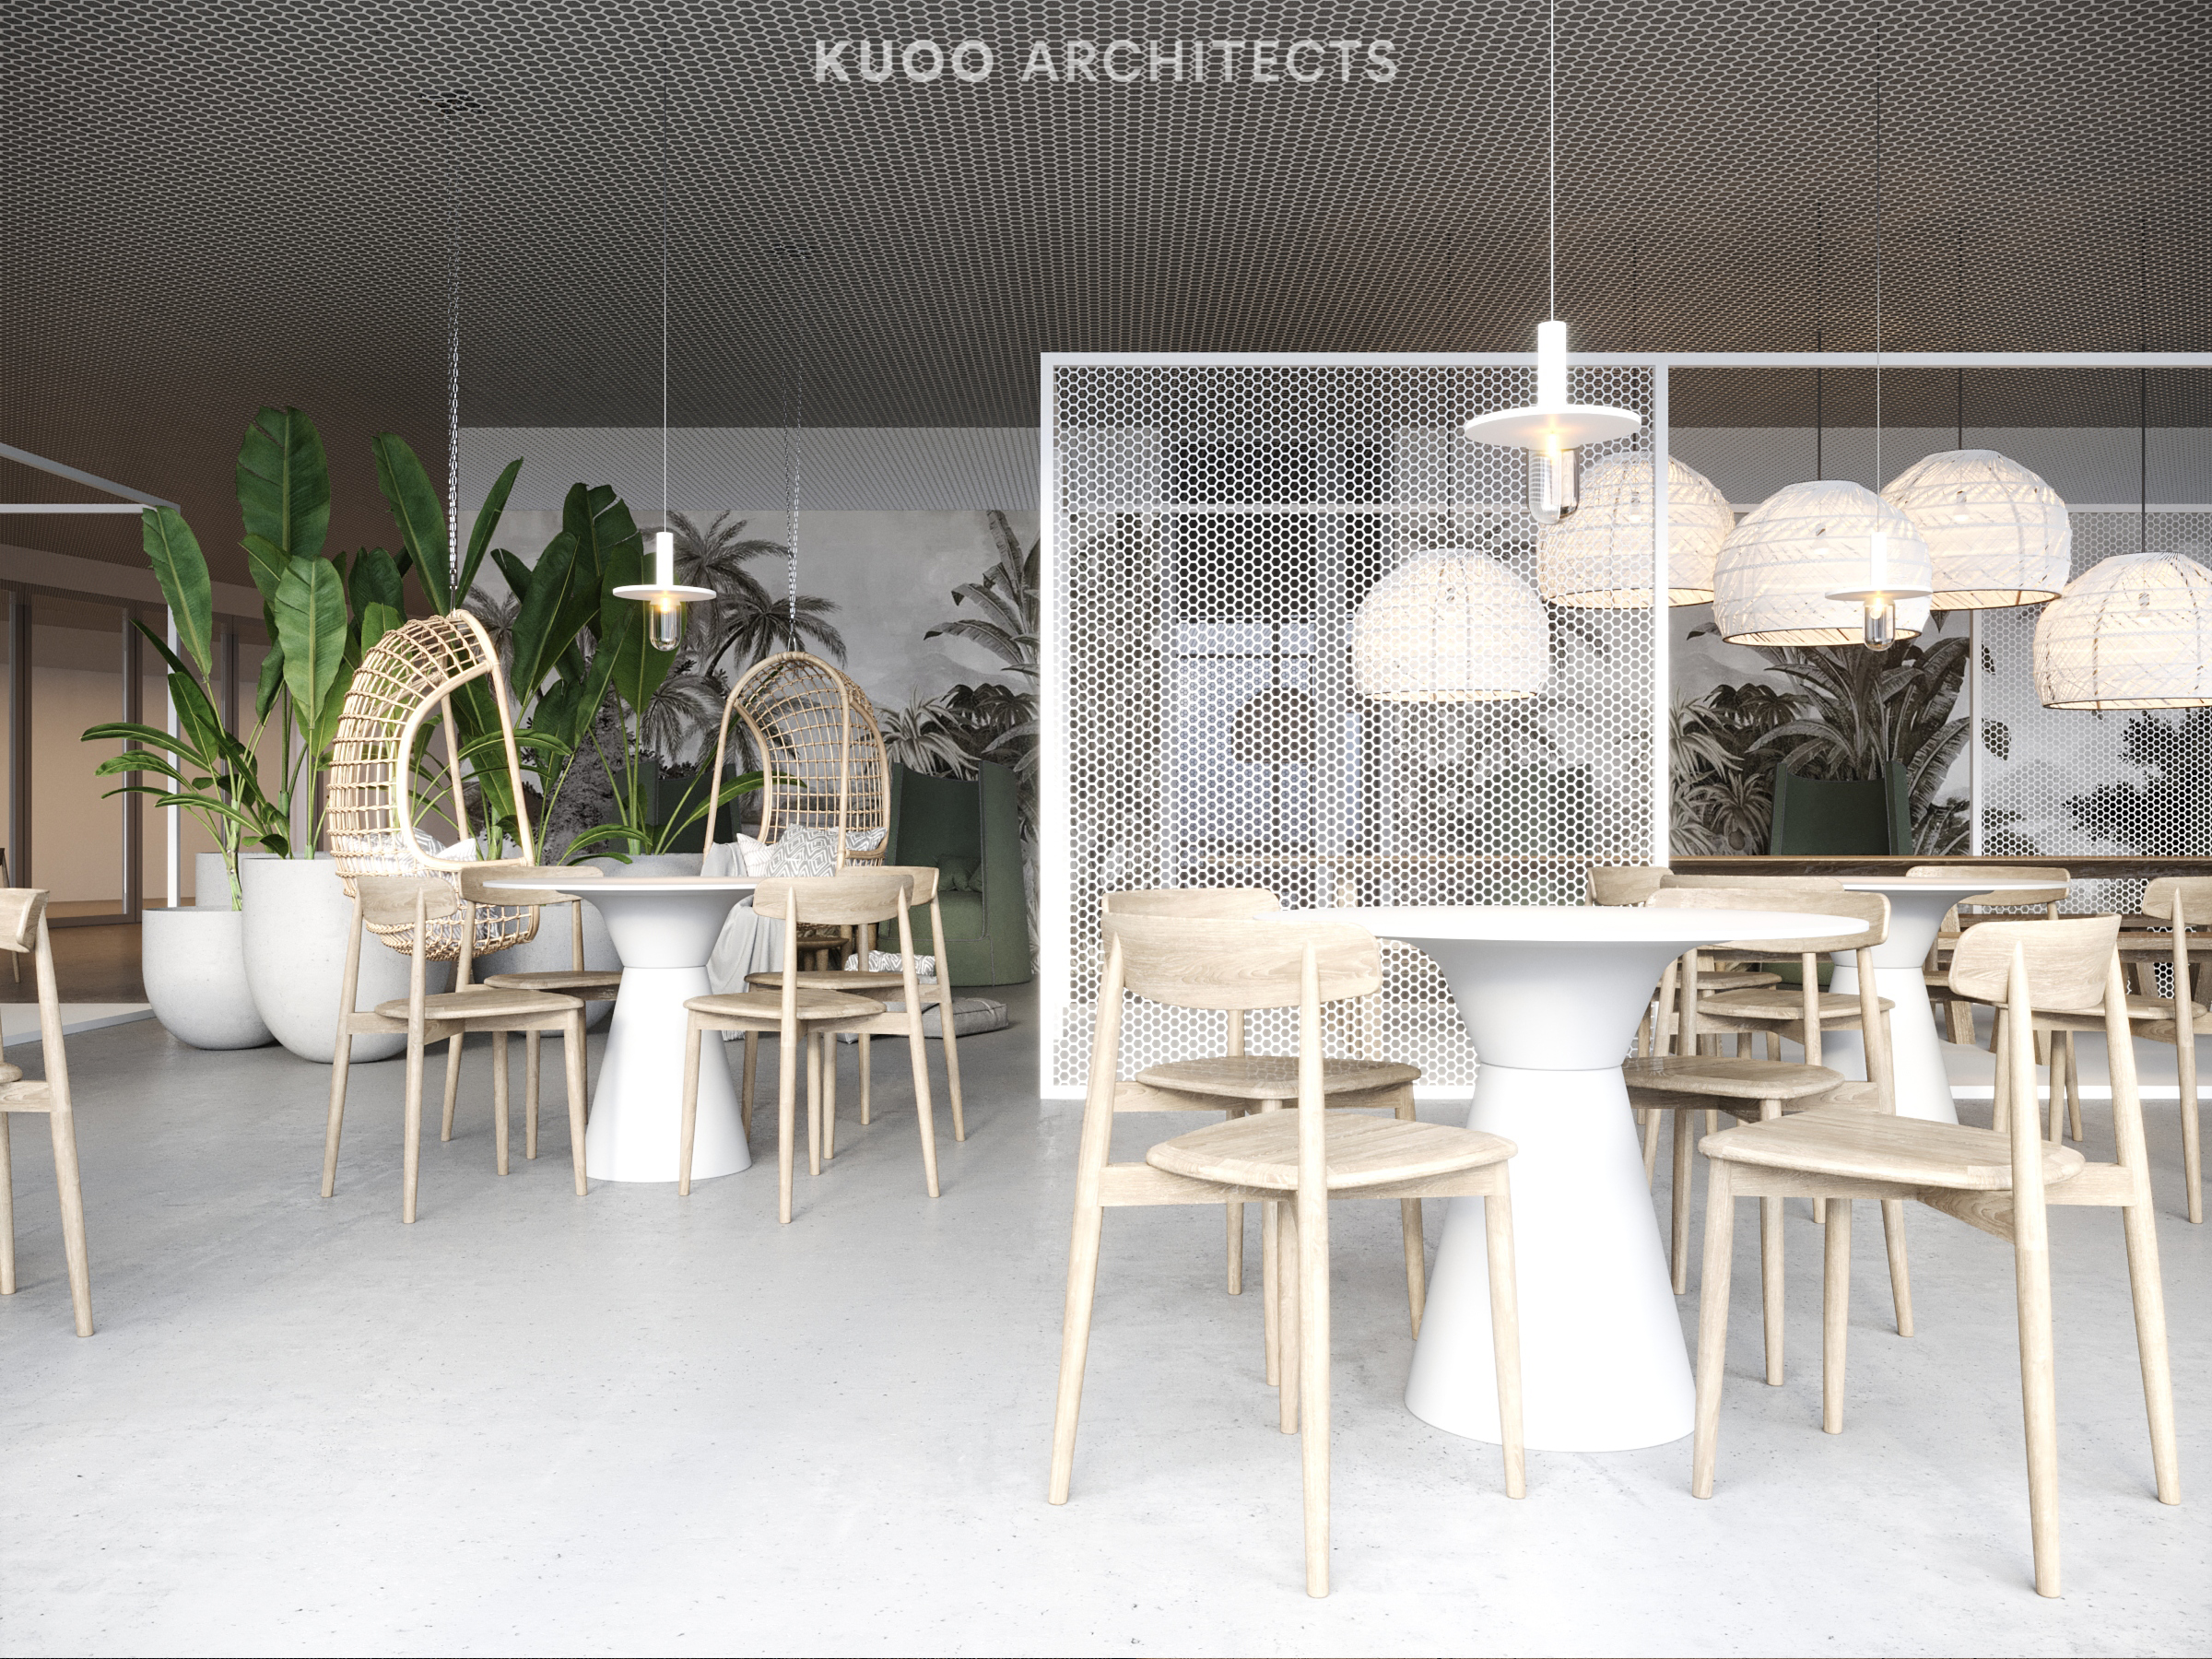 kuoo_architects_mcafe_5